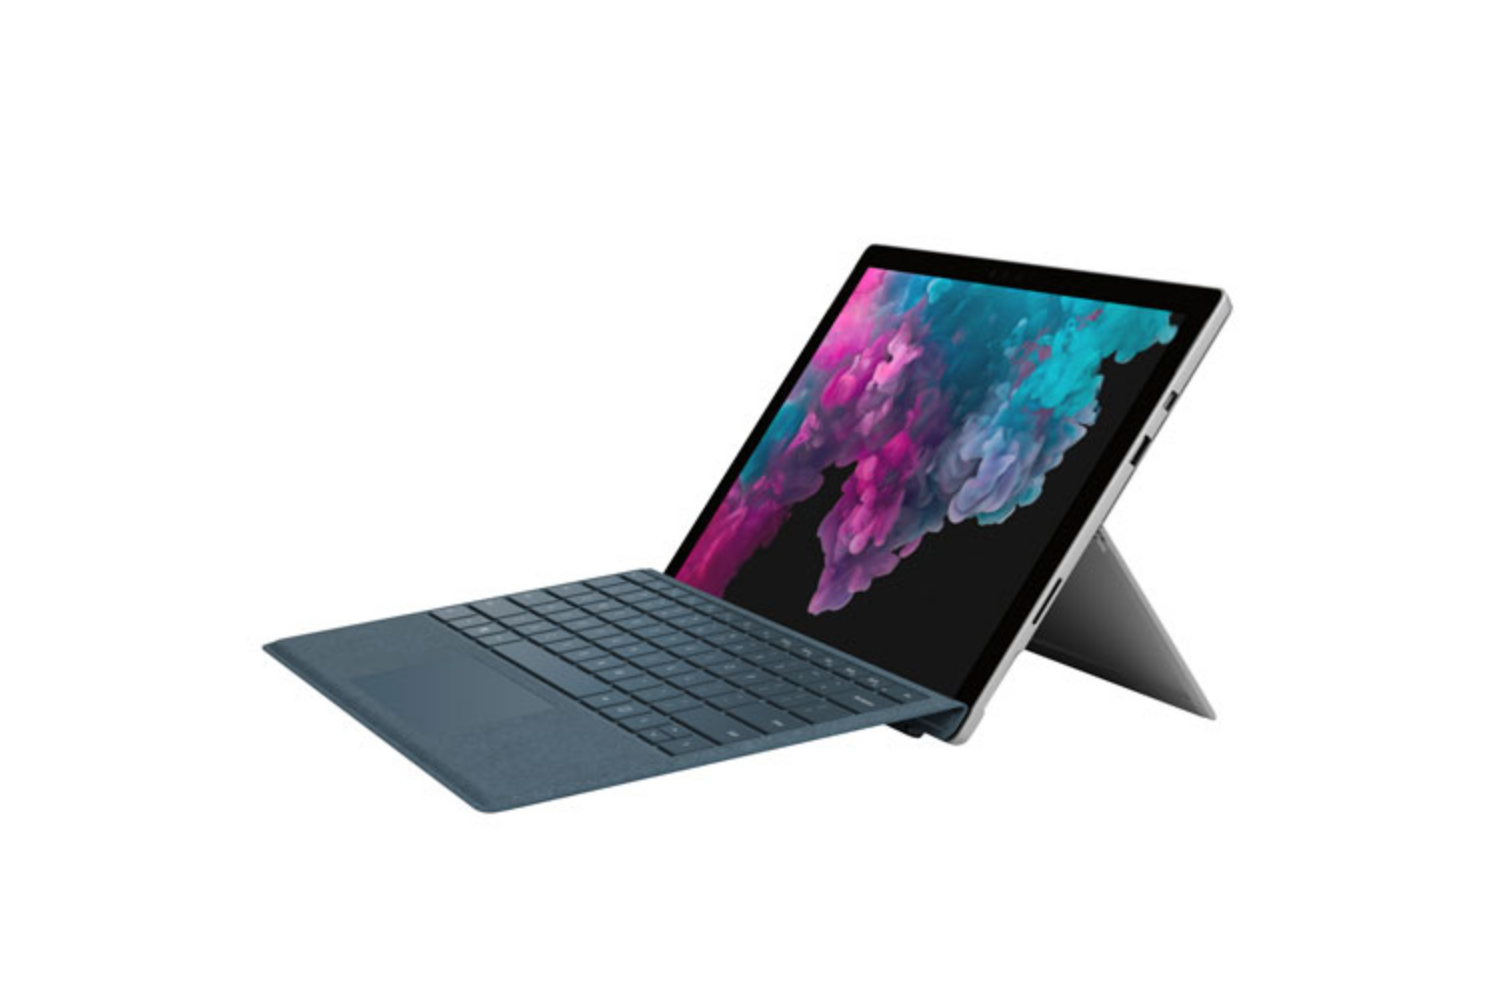 2-in-1 laptop